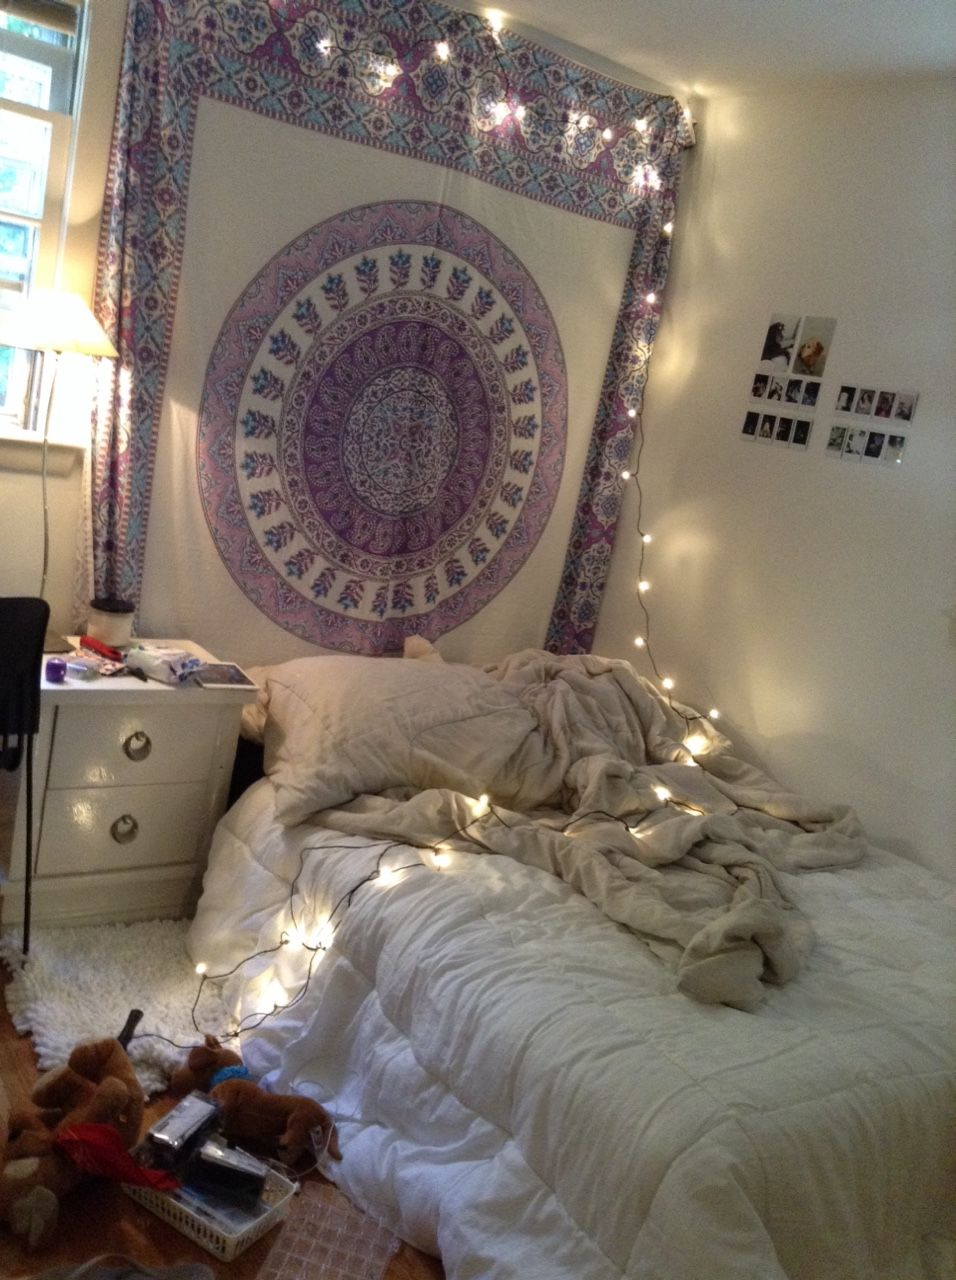 room goals | tumblr | ♥home sweet home♥ | pinterest | room goals